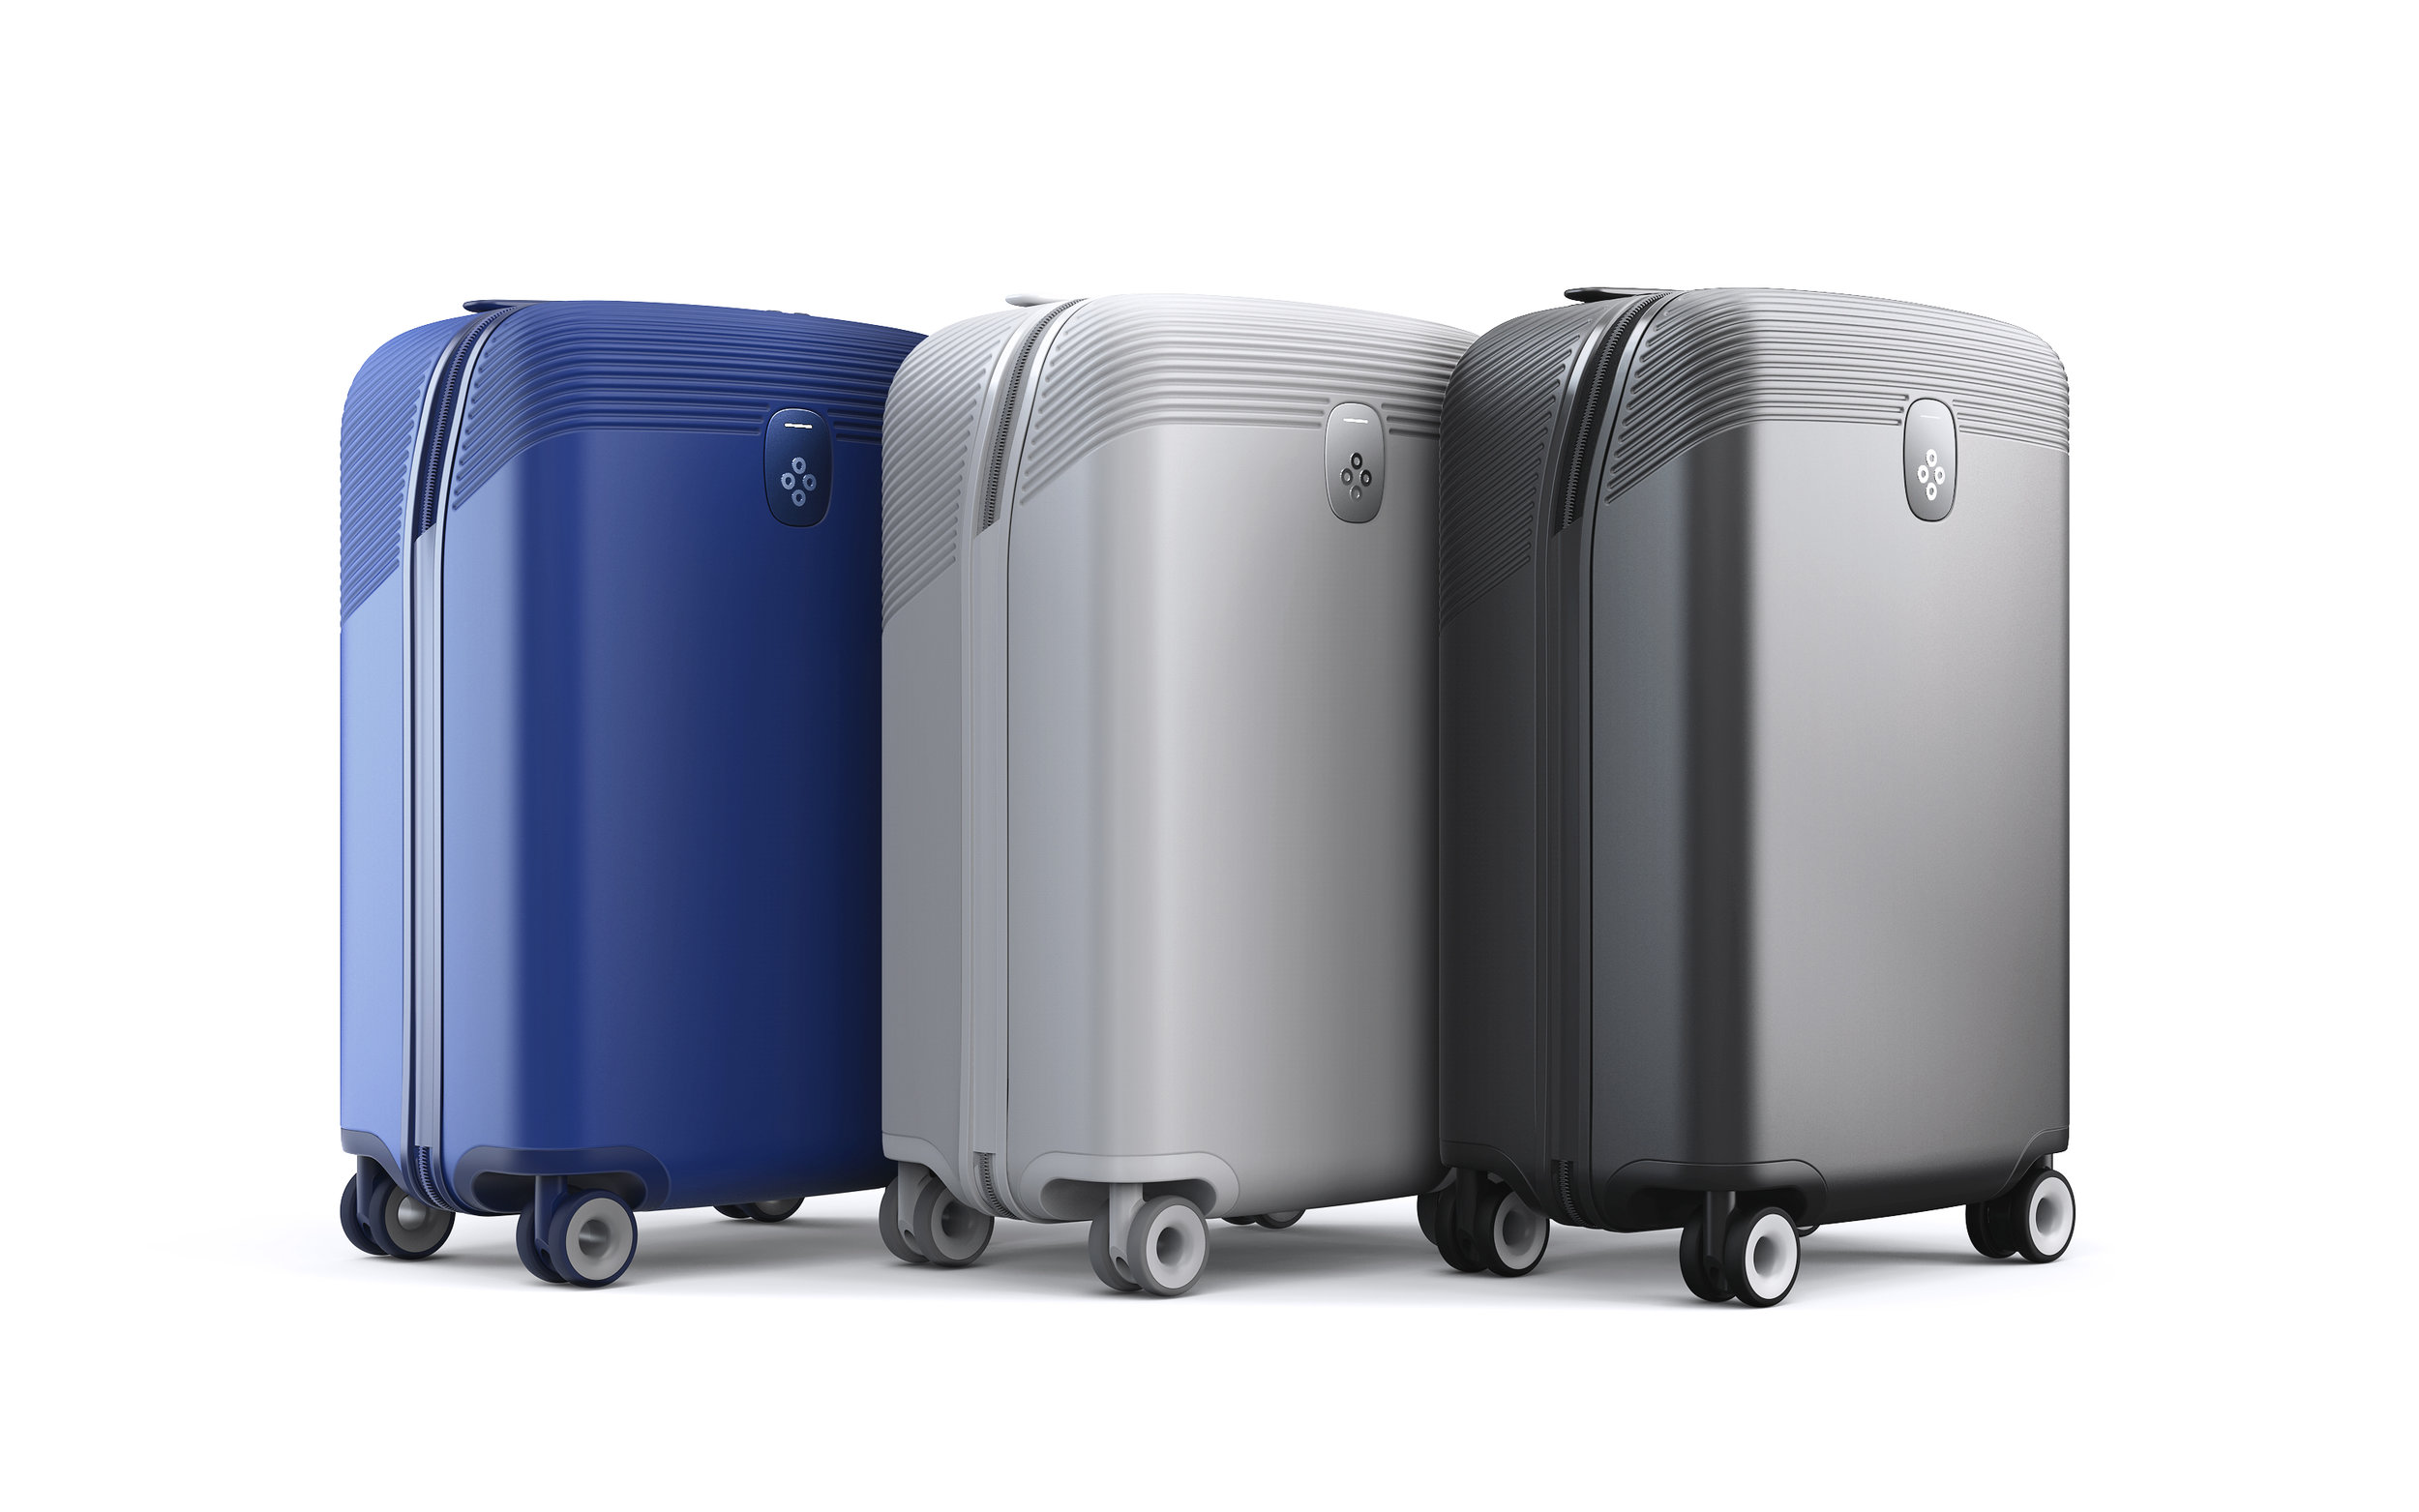 BlueSmart - Multi-function smart luggage